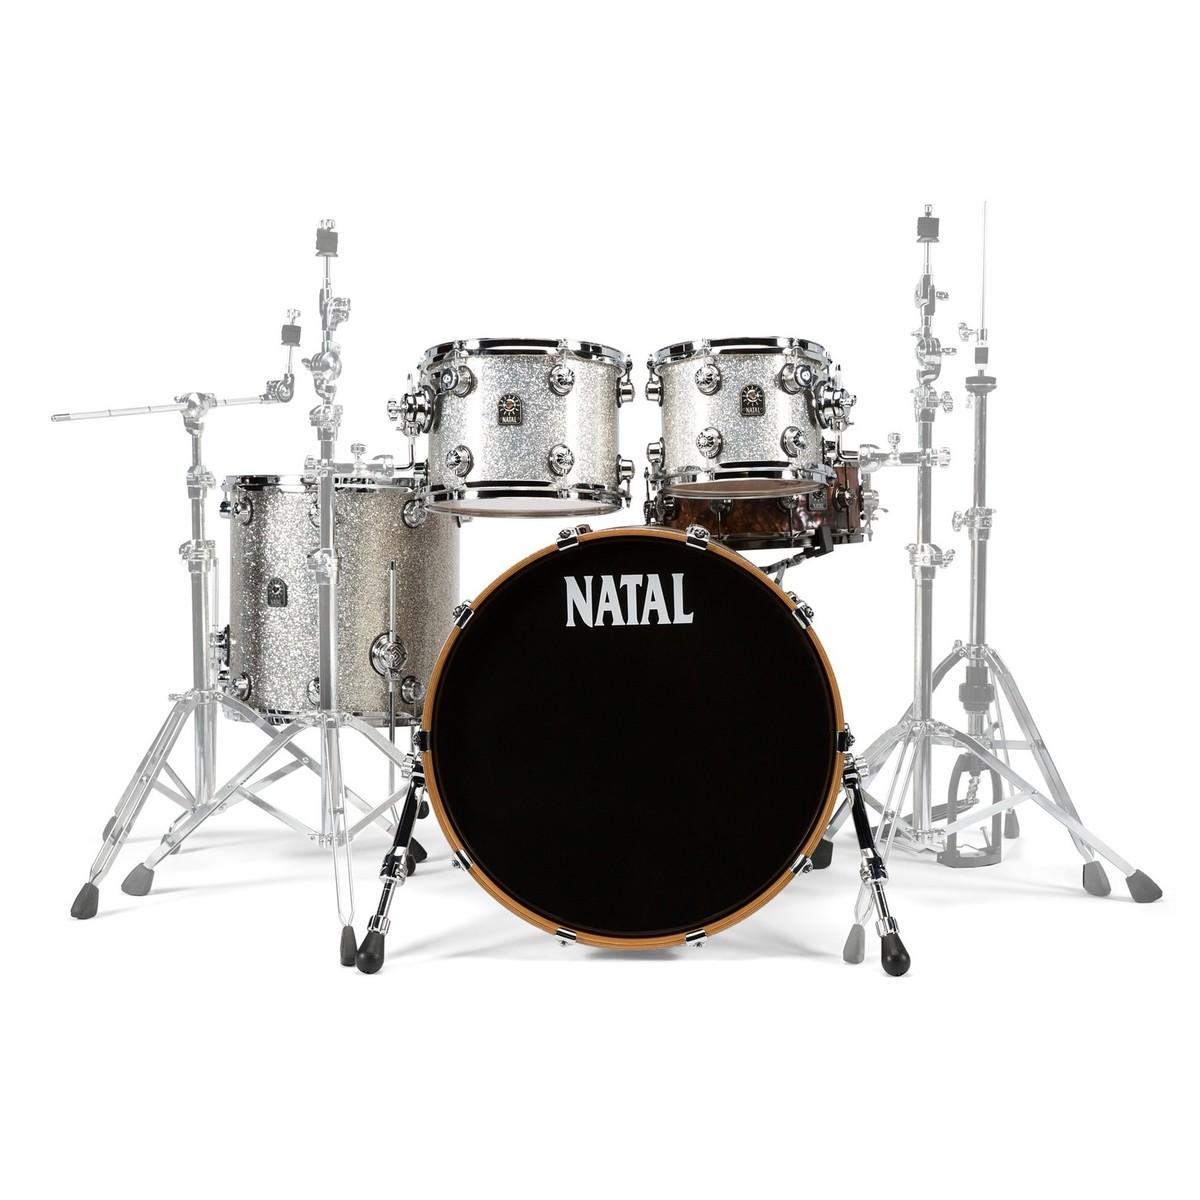 natal originals maple 22 u0026 39  u0026 39  4pc shell pack  silver sparkle